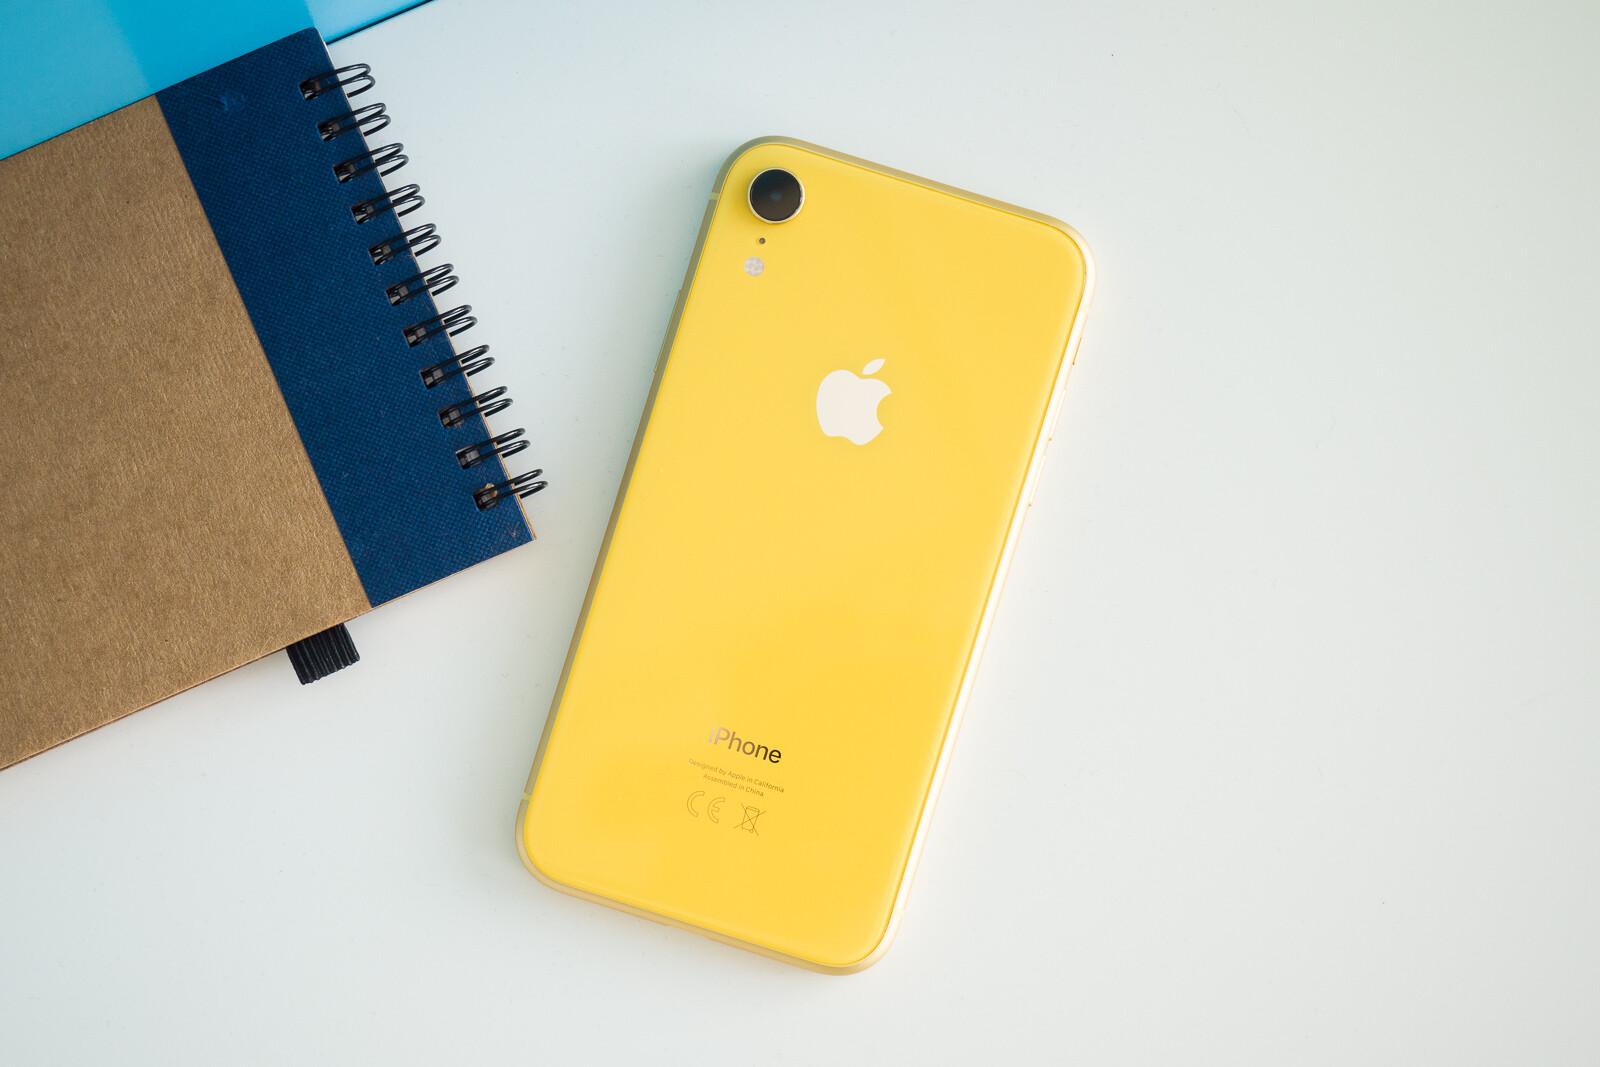 Best iPhone SE alternatives